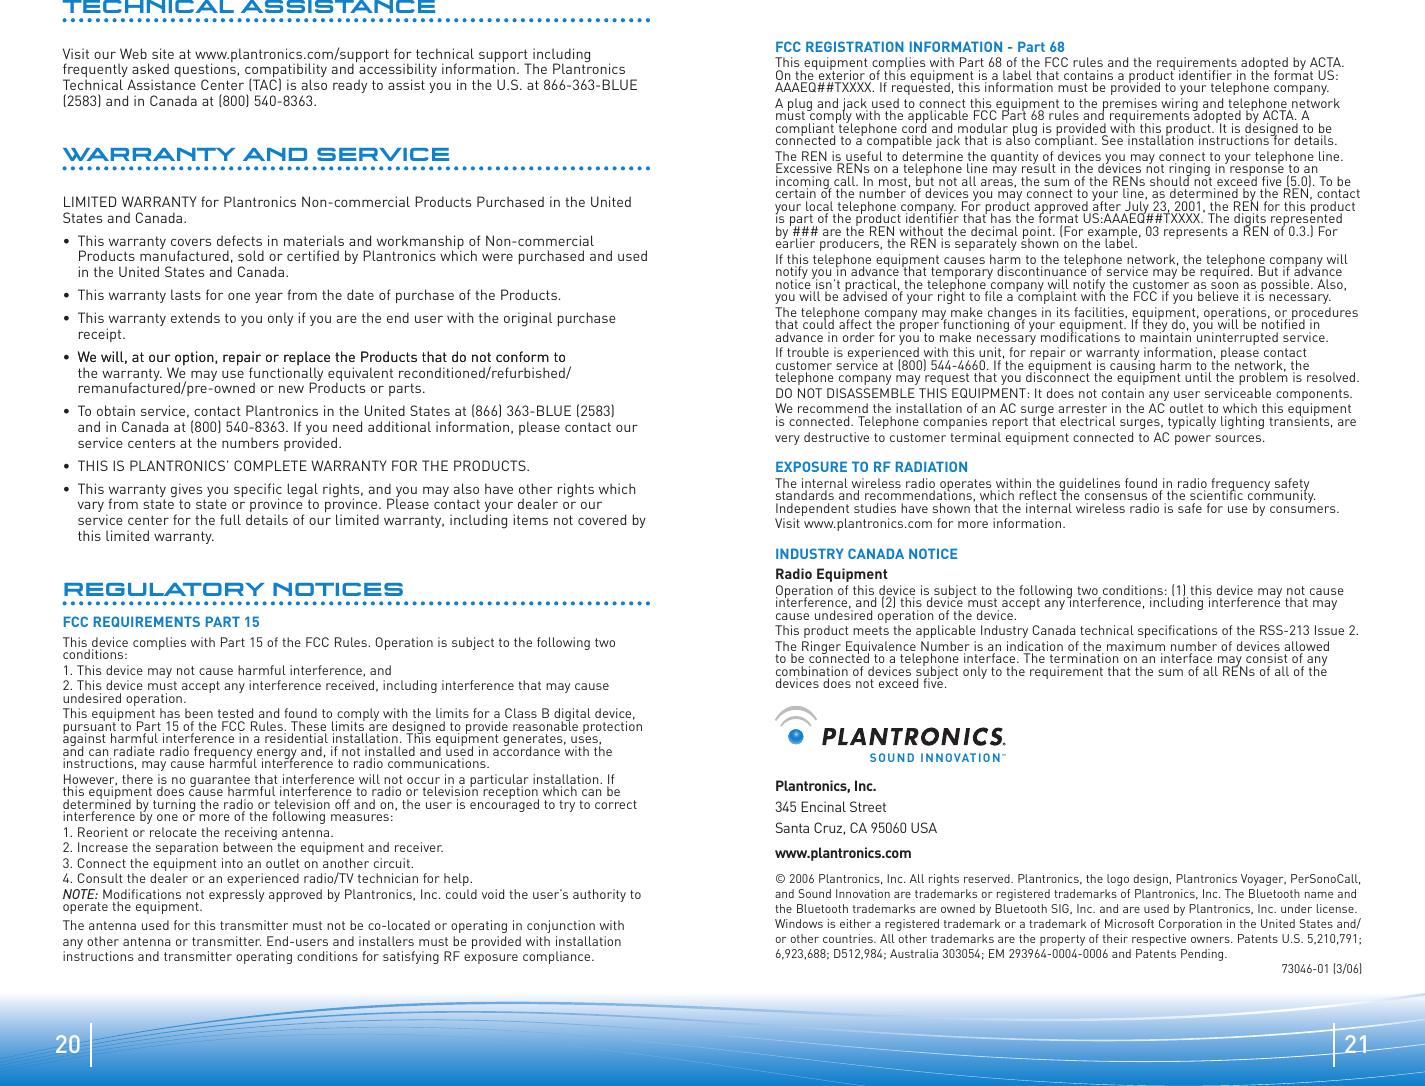 plantronics ca10 instruction manual